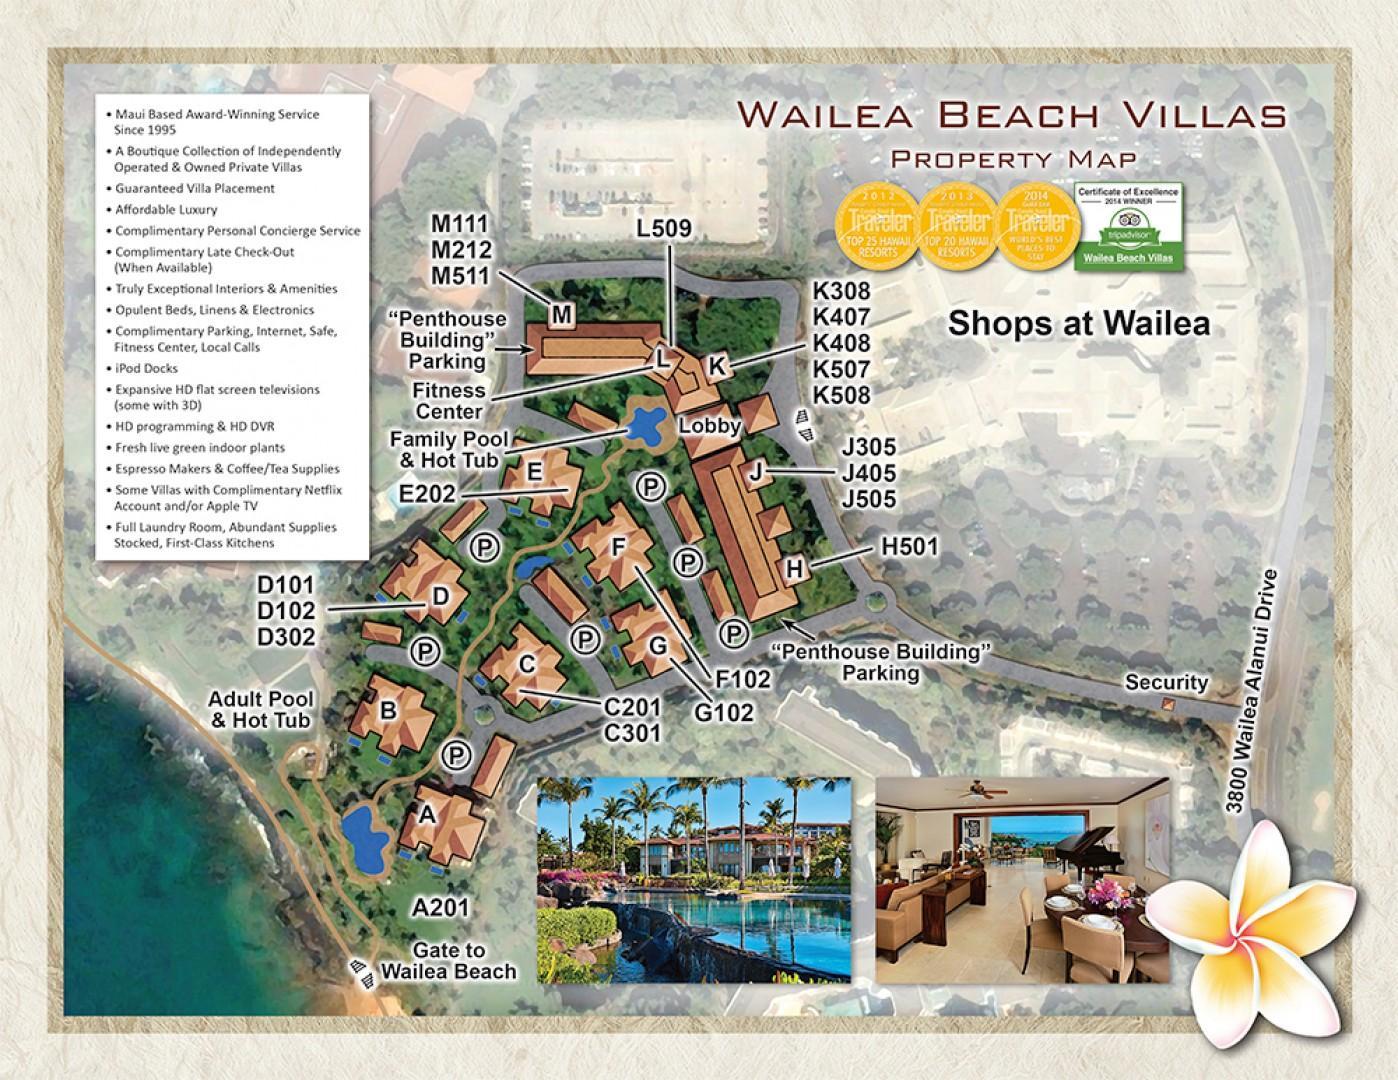 Wailea Beach Villas property map.